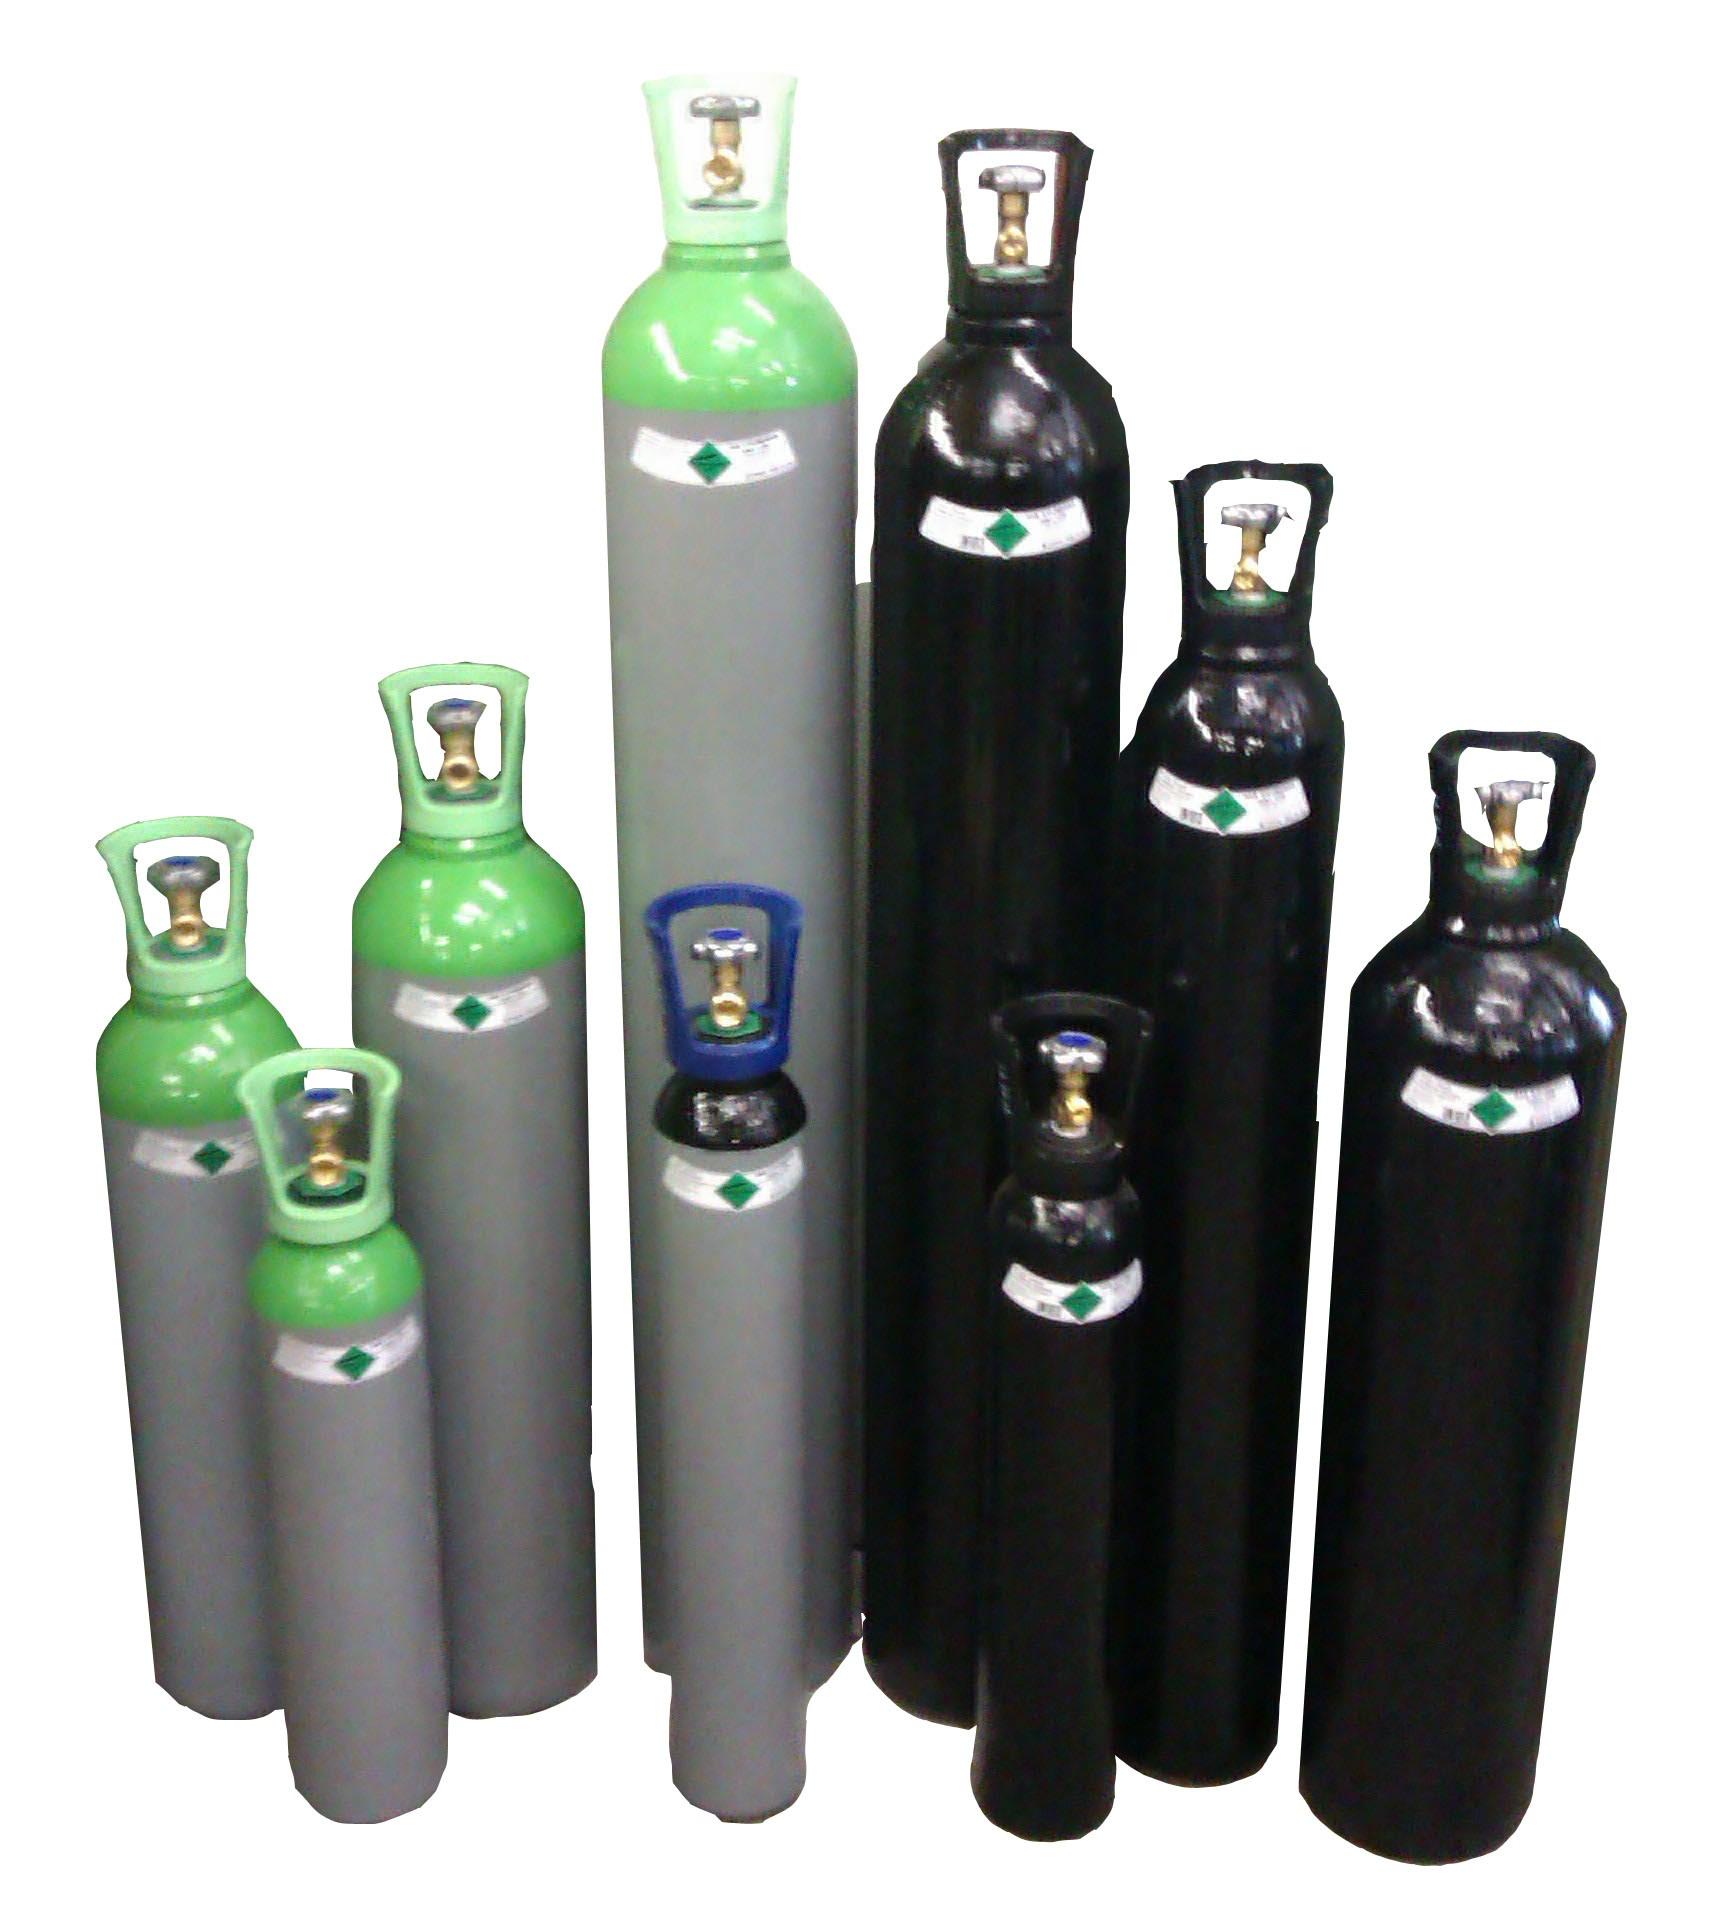 5 Ways to Ensure Safe Gas Cylinder Storage